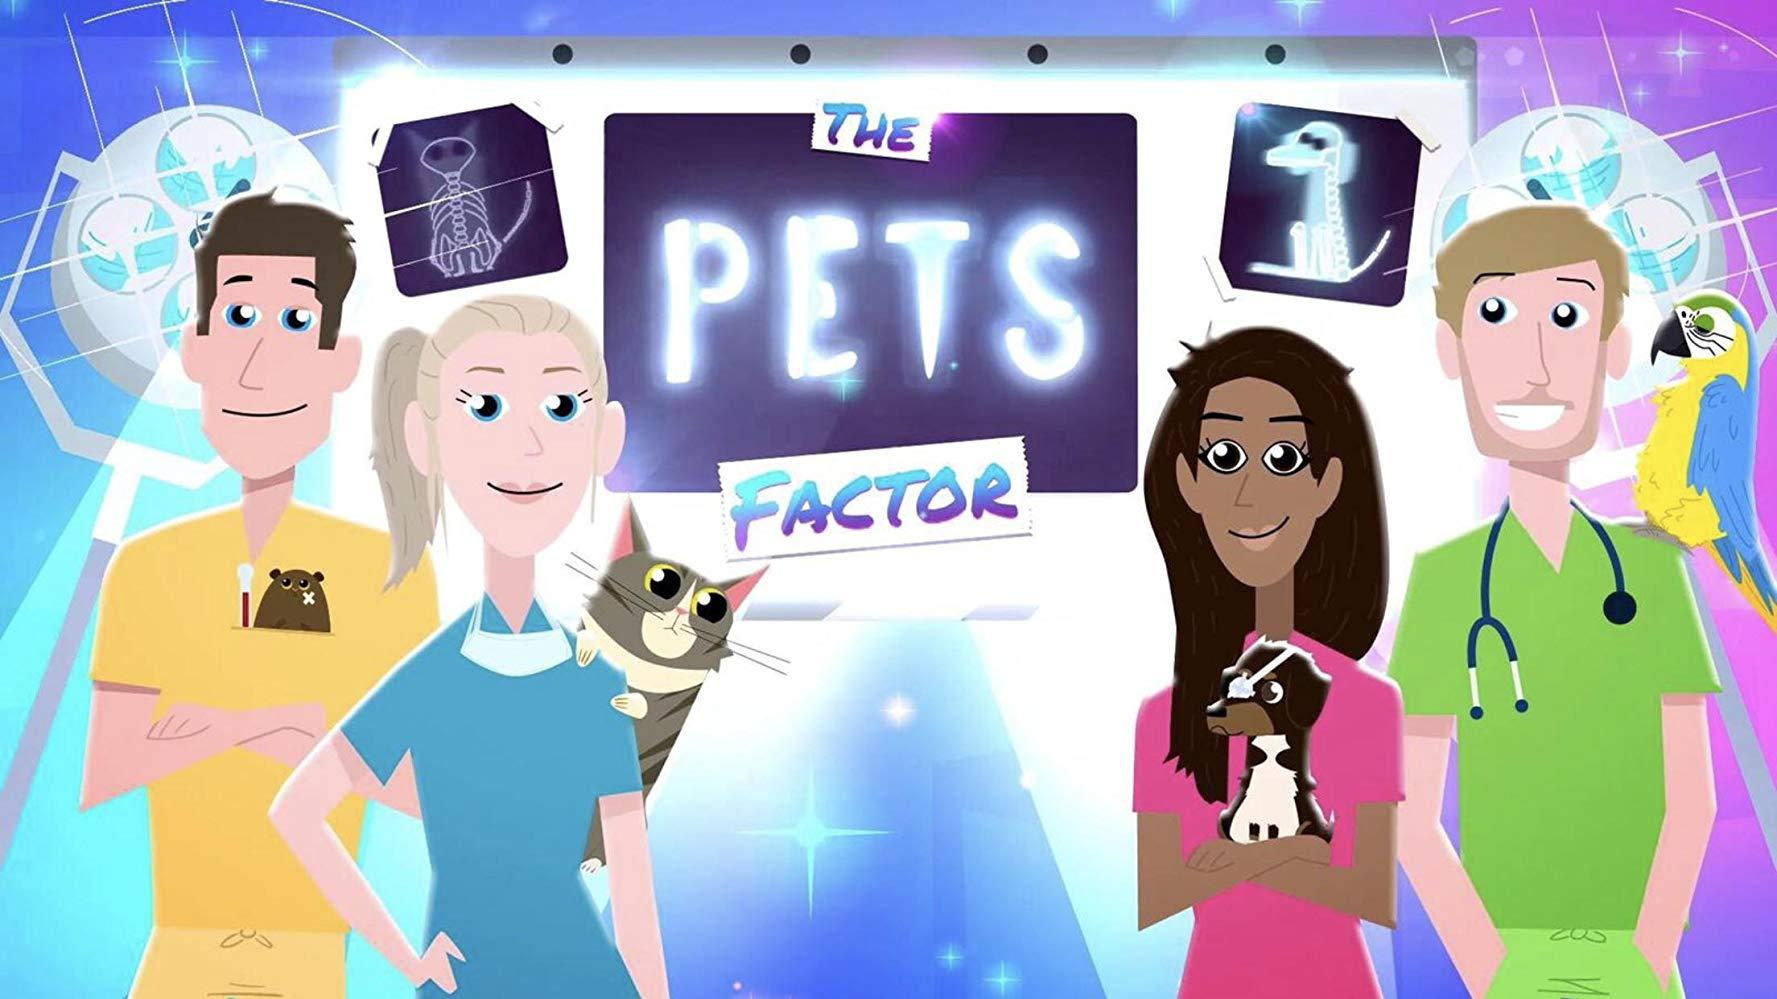 The Pets Factor S04E12 INTERNAL 720p WEB h264-WEBTUBE